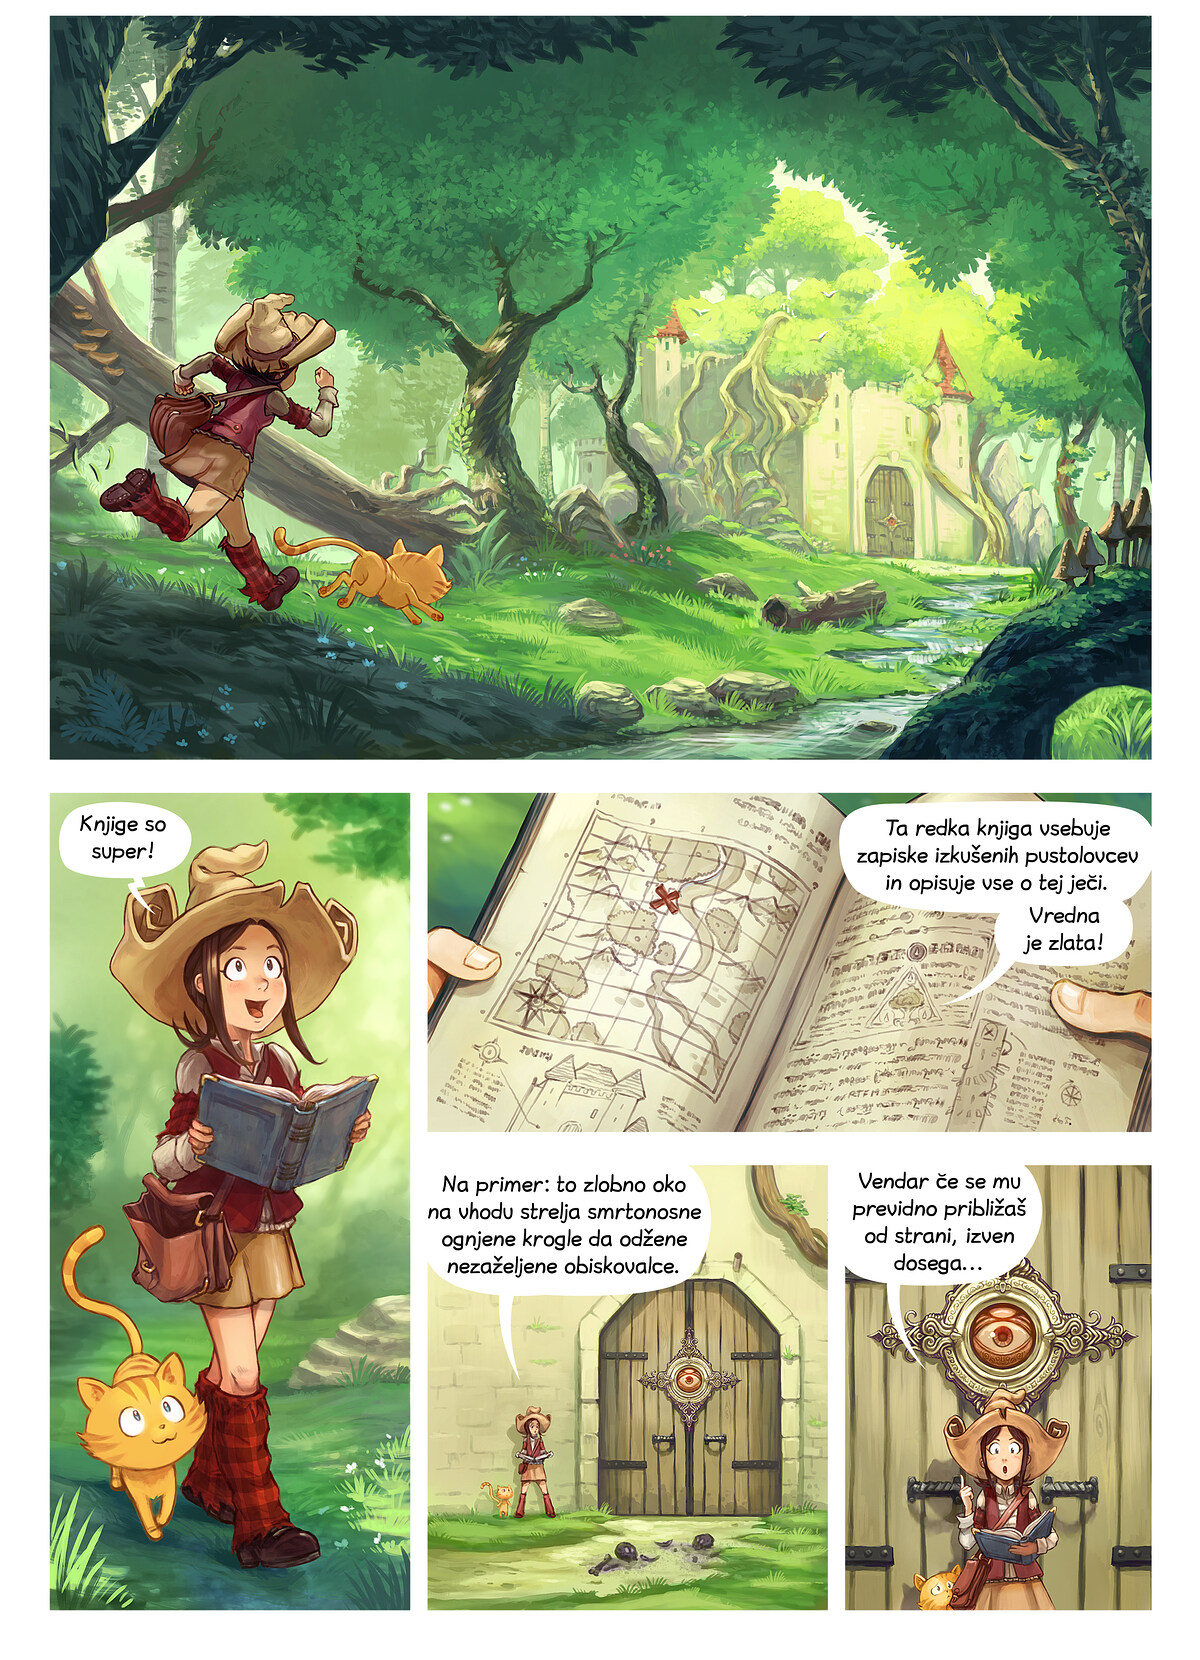 Epizoda 26: Knjige so super, Page 1